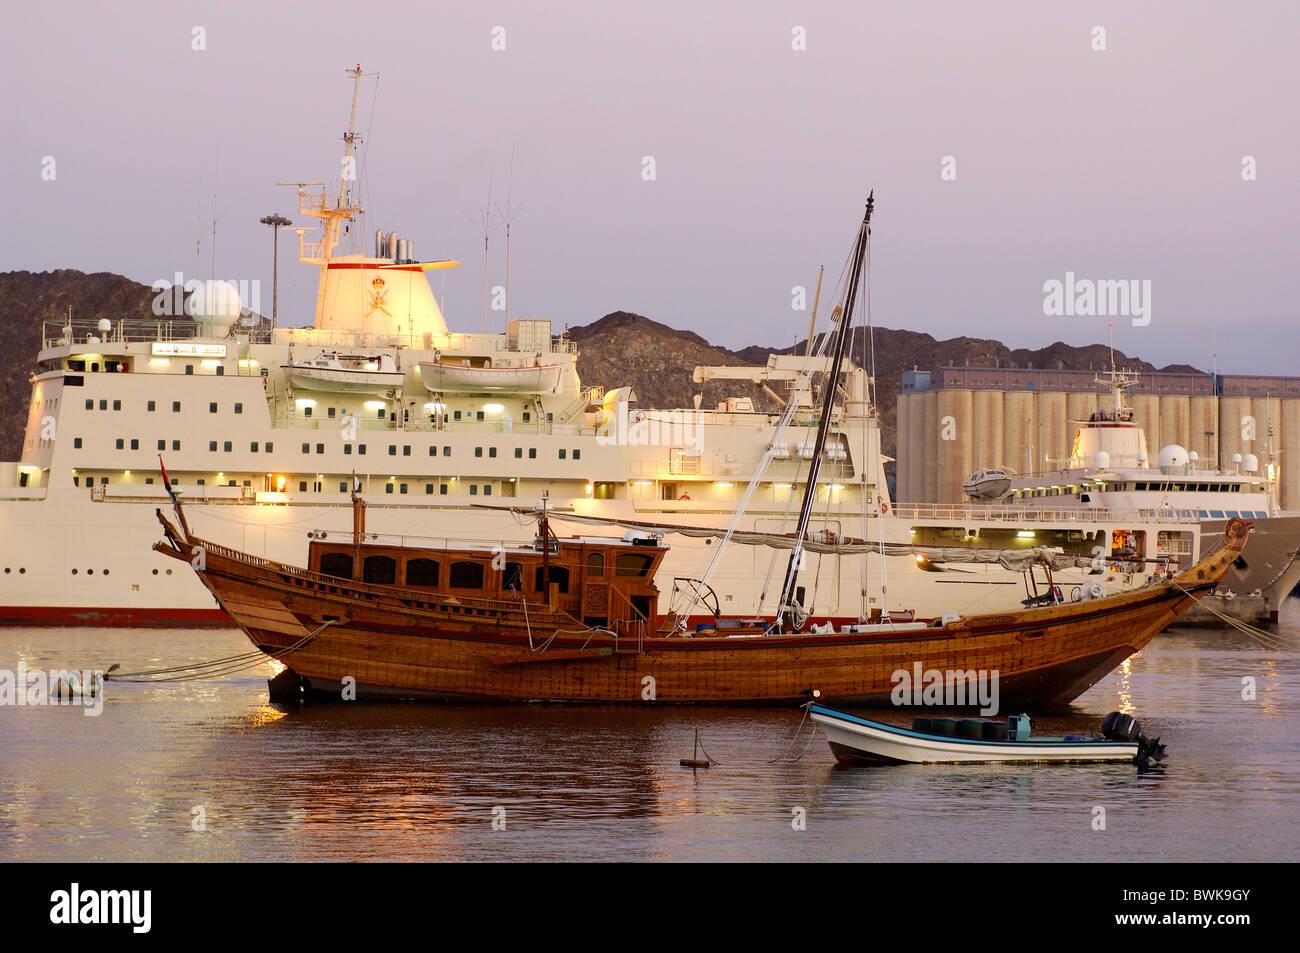 harbor port ship ships boats mood sea coast dusk twilight Muttrah courage yard Maskat Muscat Oman Arabi - Stock Image